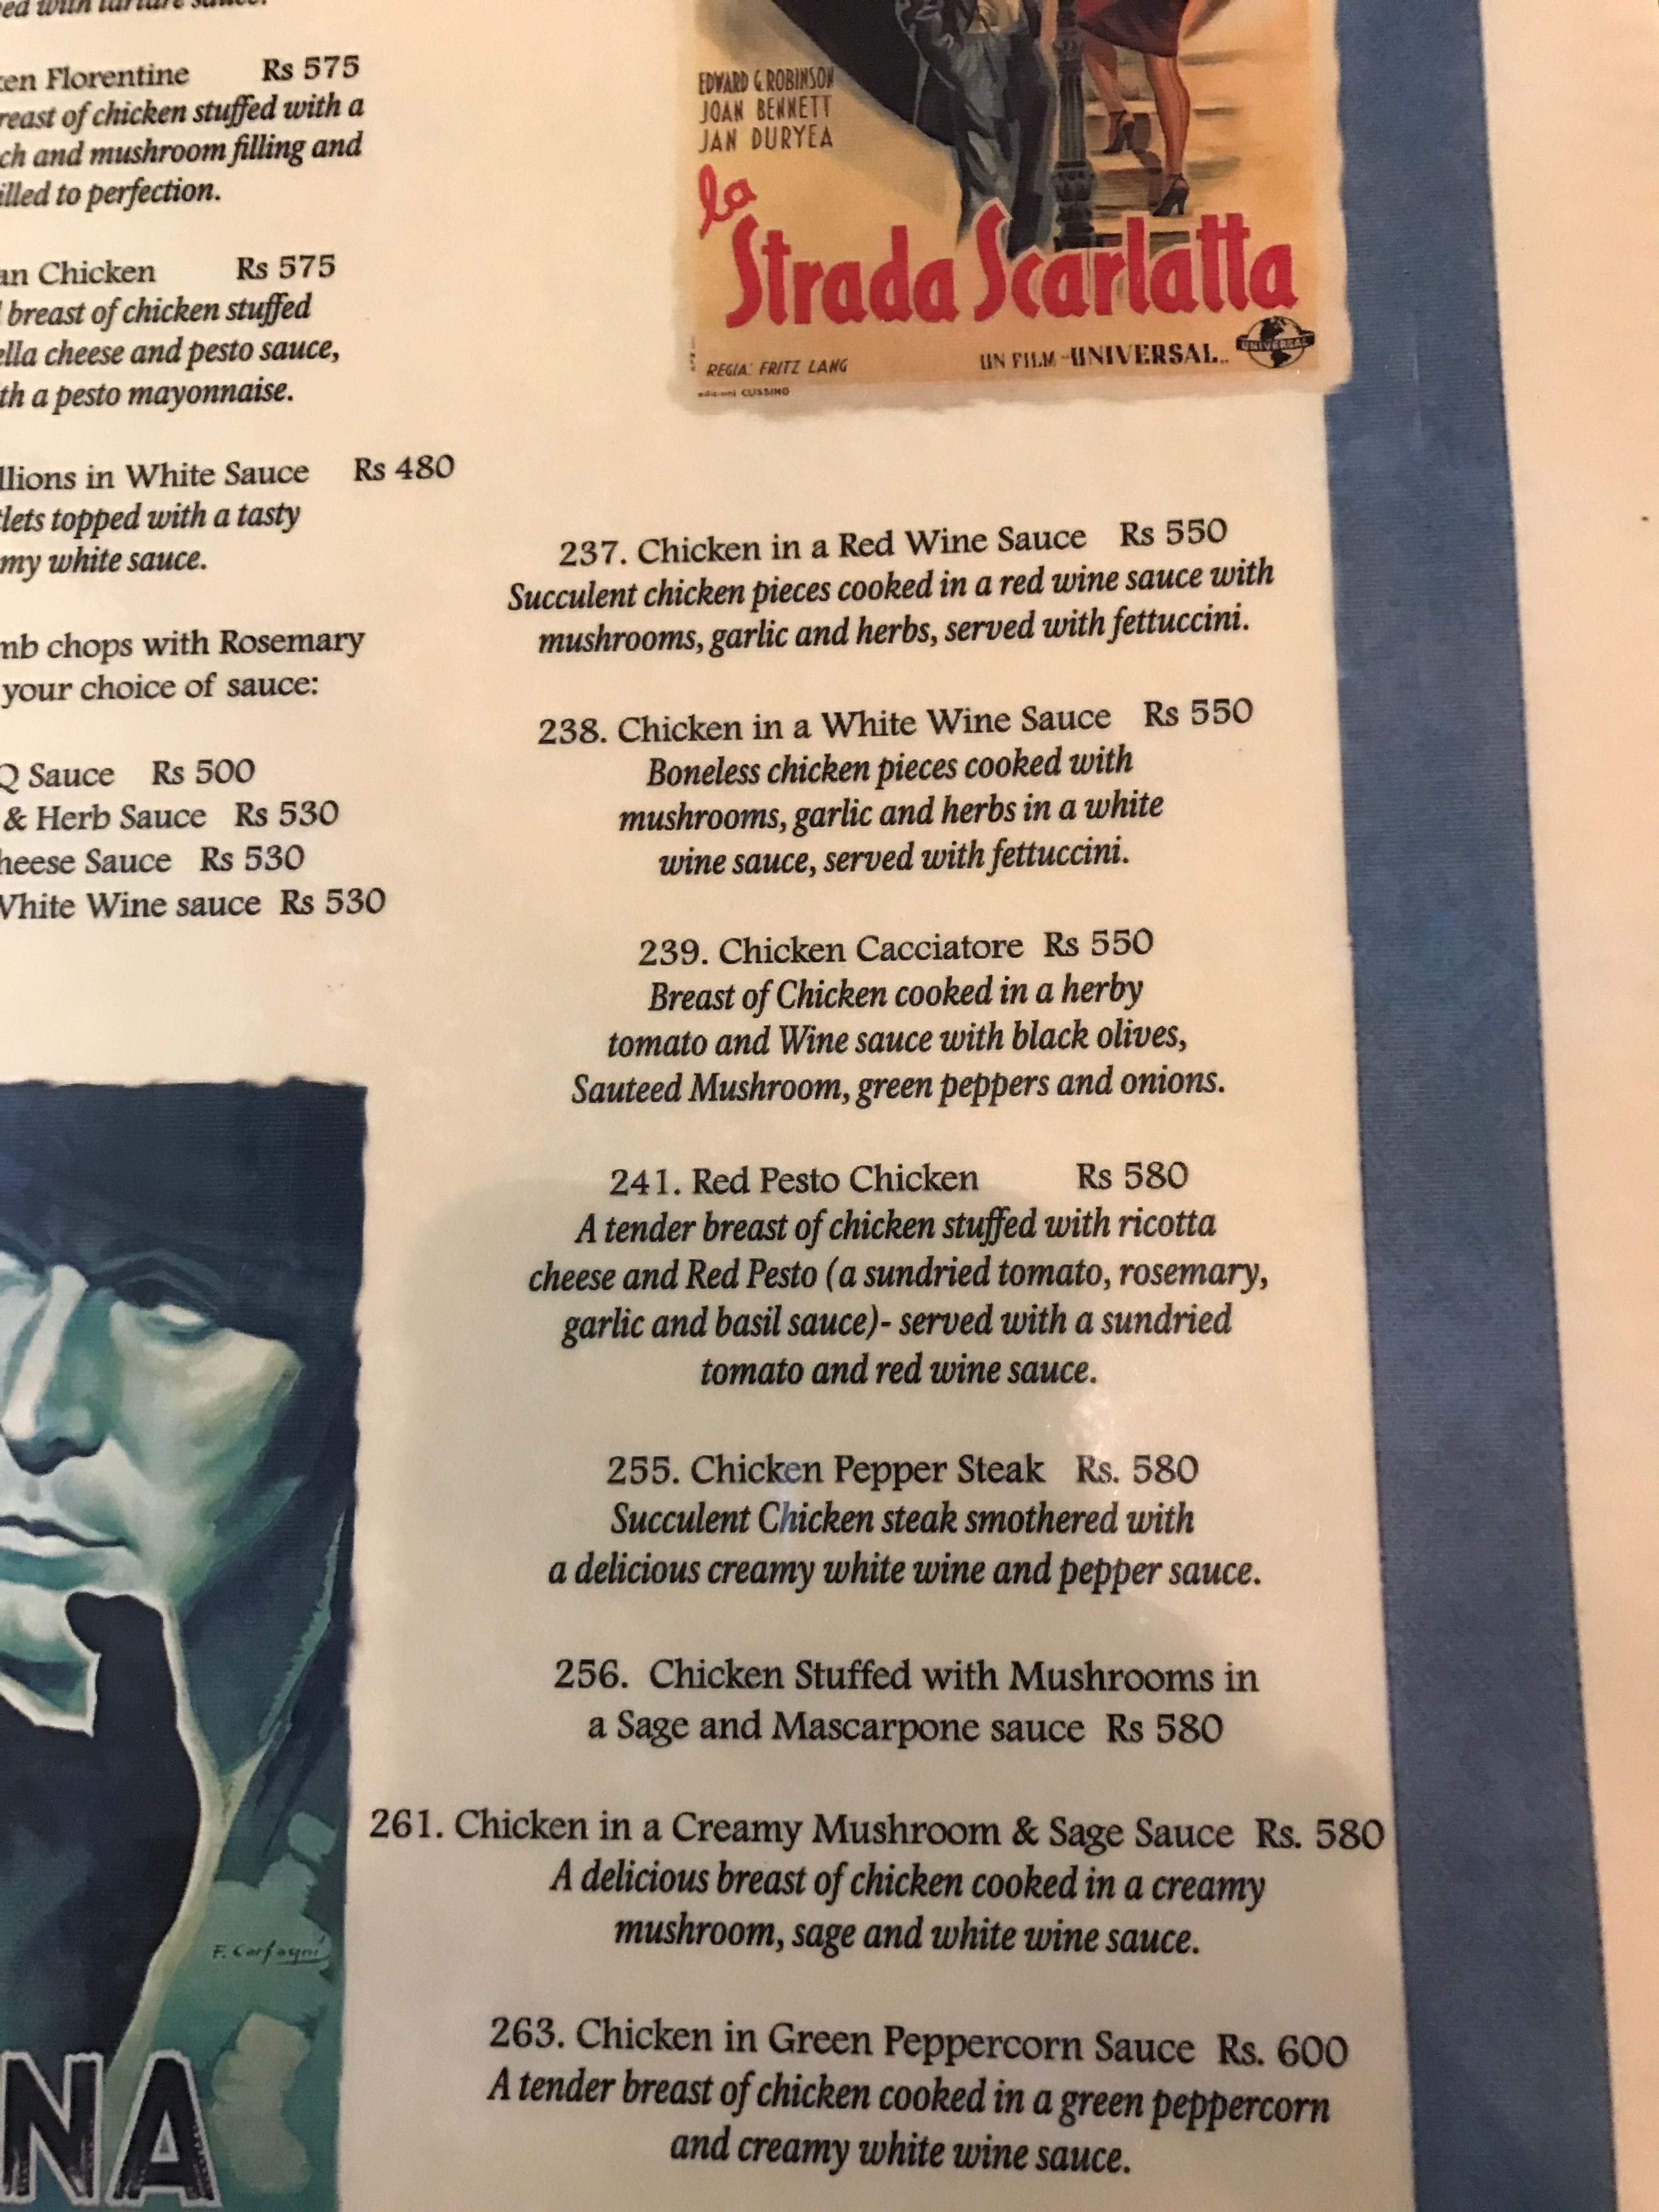 The Big Chill Cafe Menu Foodgoodseries Cafe Menu Pesto Sauce White Sauce